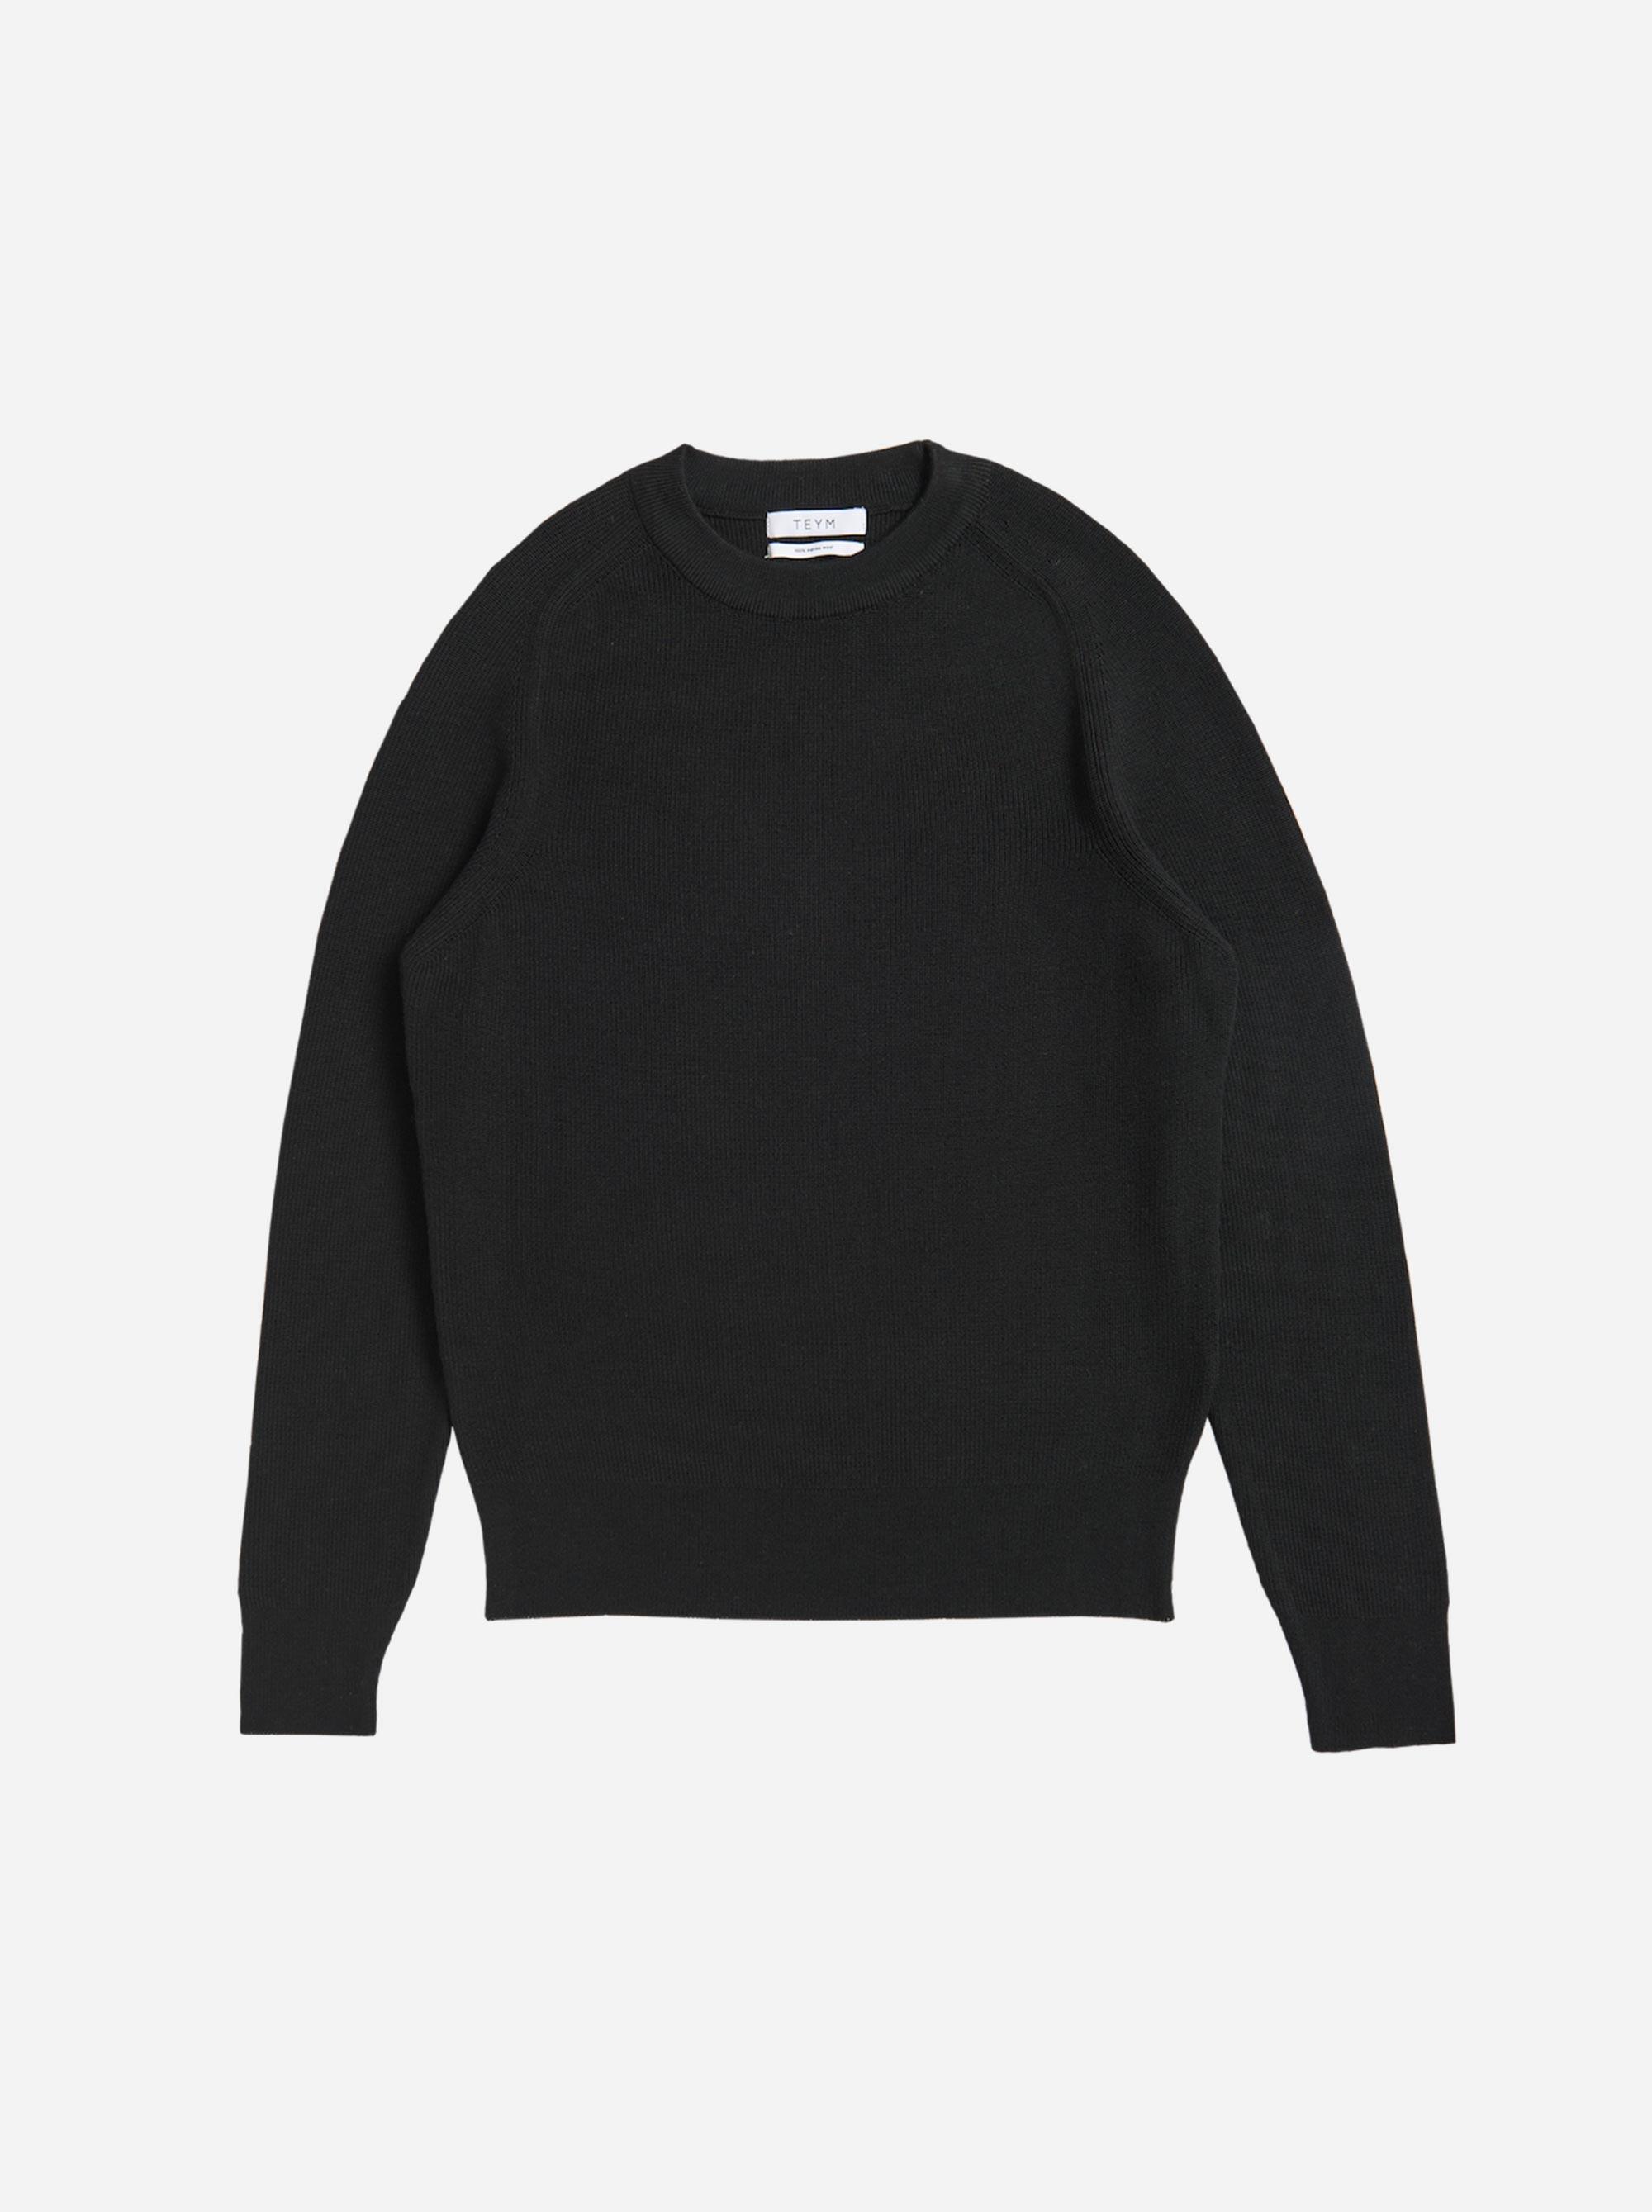 Teym - The Merino Sweater - Men - Black - 4